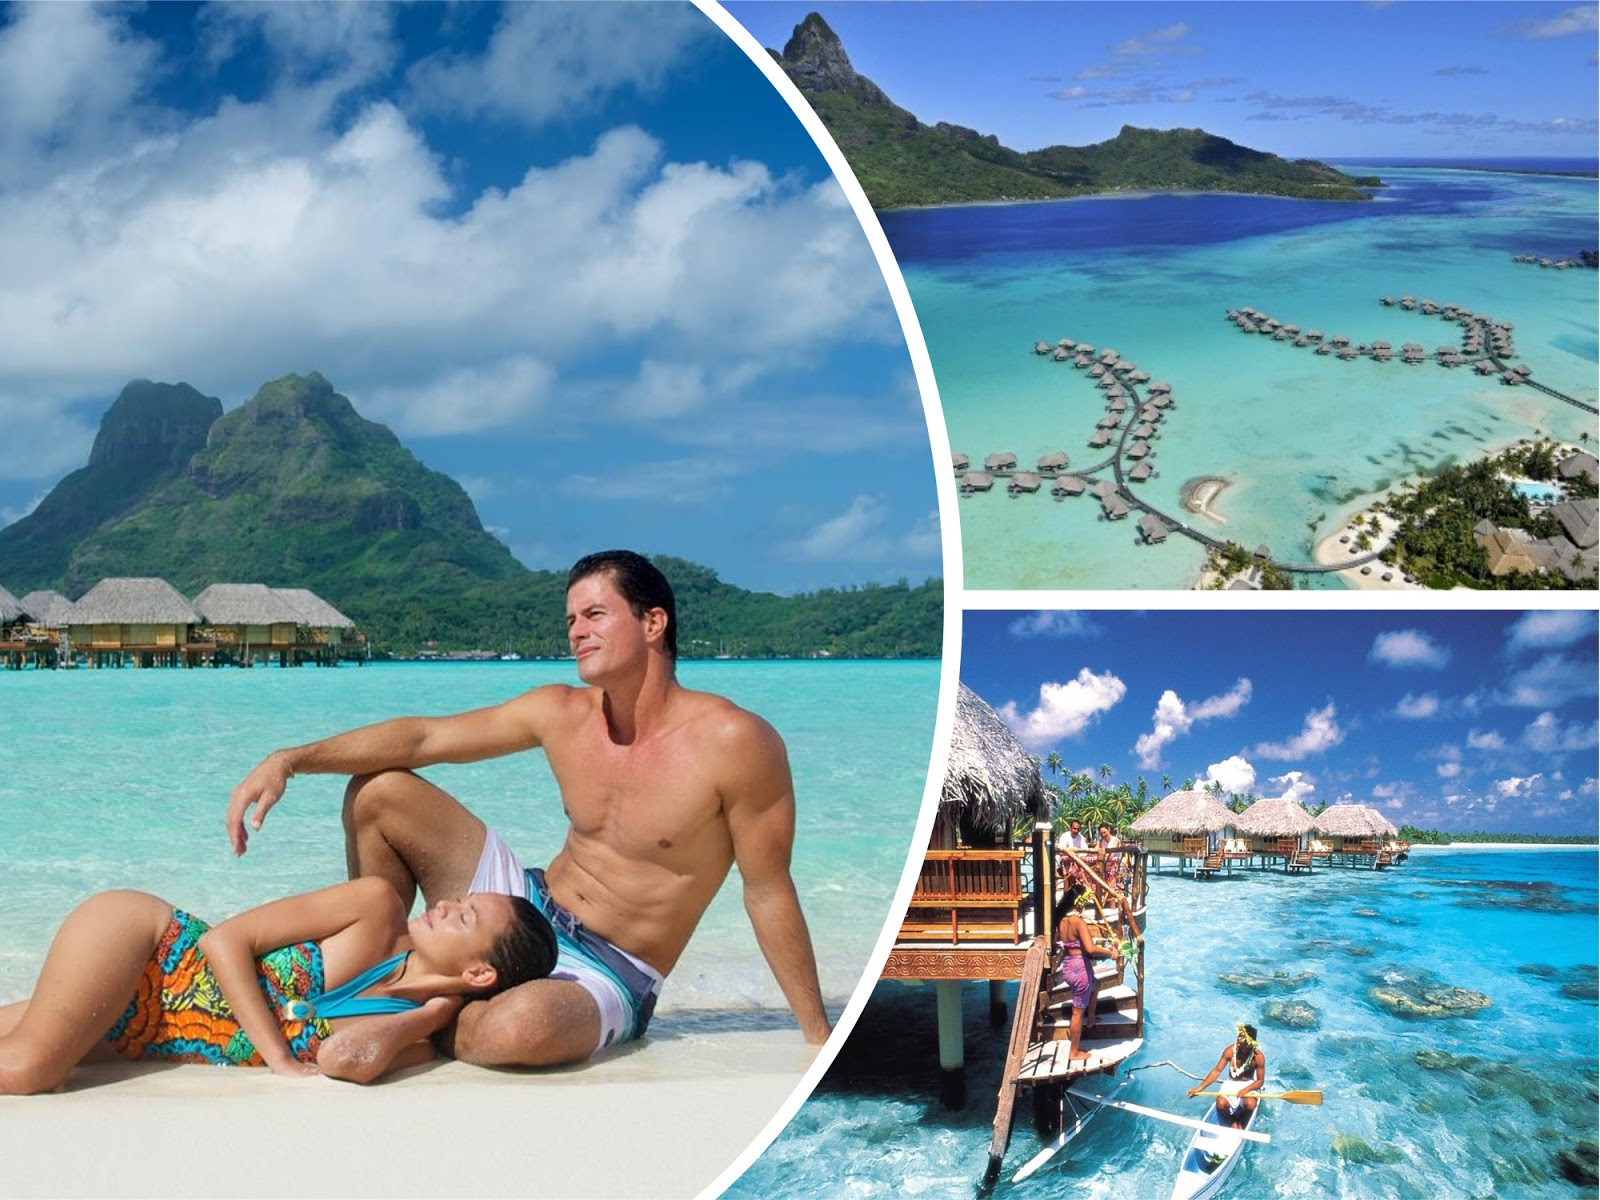 Bora Bora Islands Most Luxurious Honeymoon Destinations amazingexplore